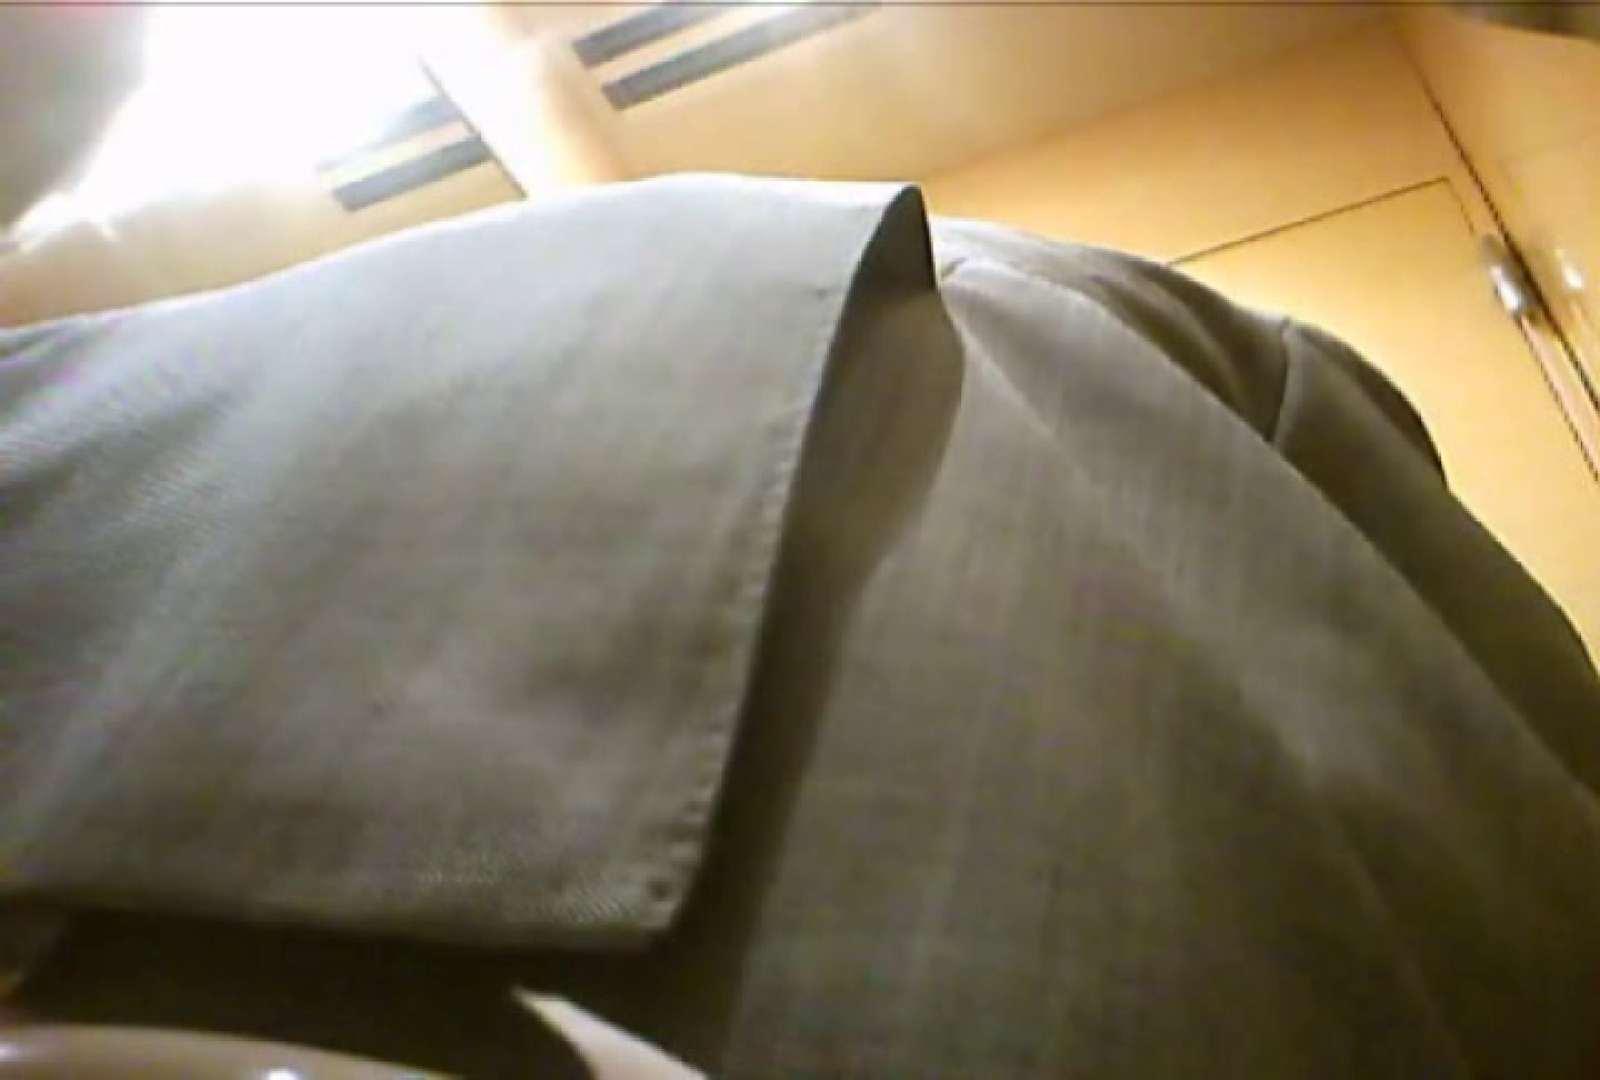 SEASON 2ND!掴み取りさんの洗面所覗き!in新幹線!VOL.02 スーツボーイズ | ノンケボーイズ  82pic 24